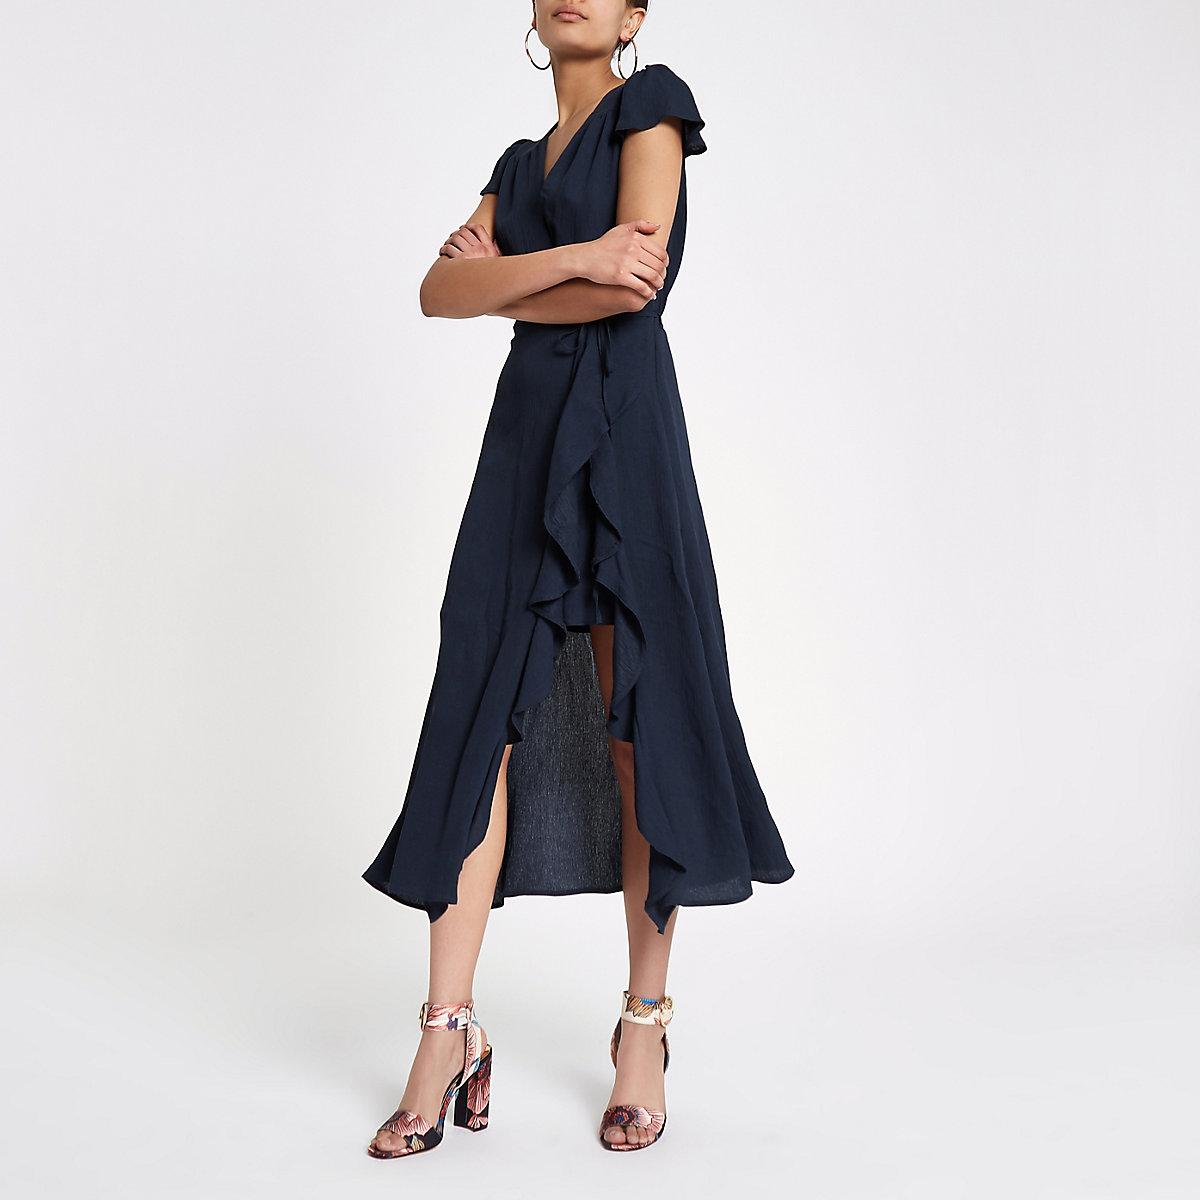 bbc1822492 Navy frill wrap front midi dress - Swing Dresses - Dresses - women